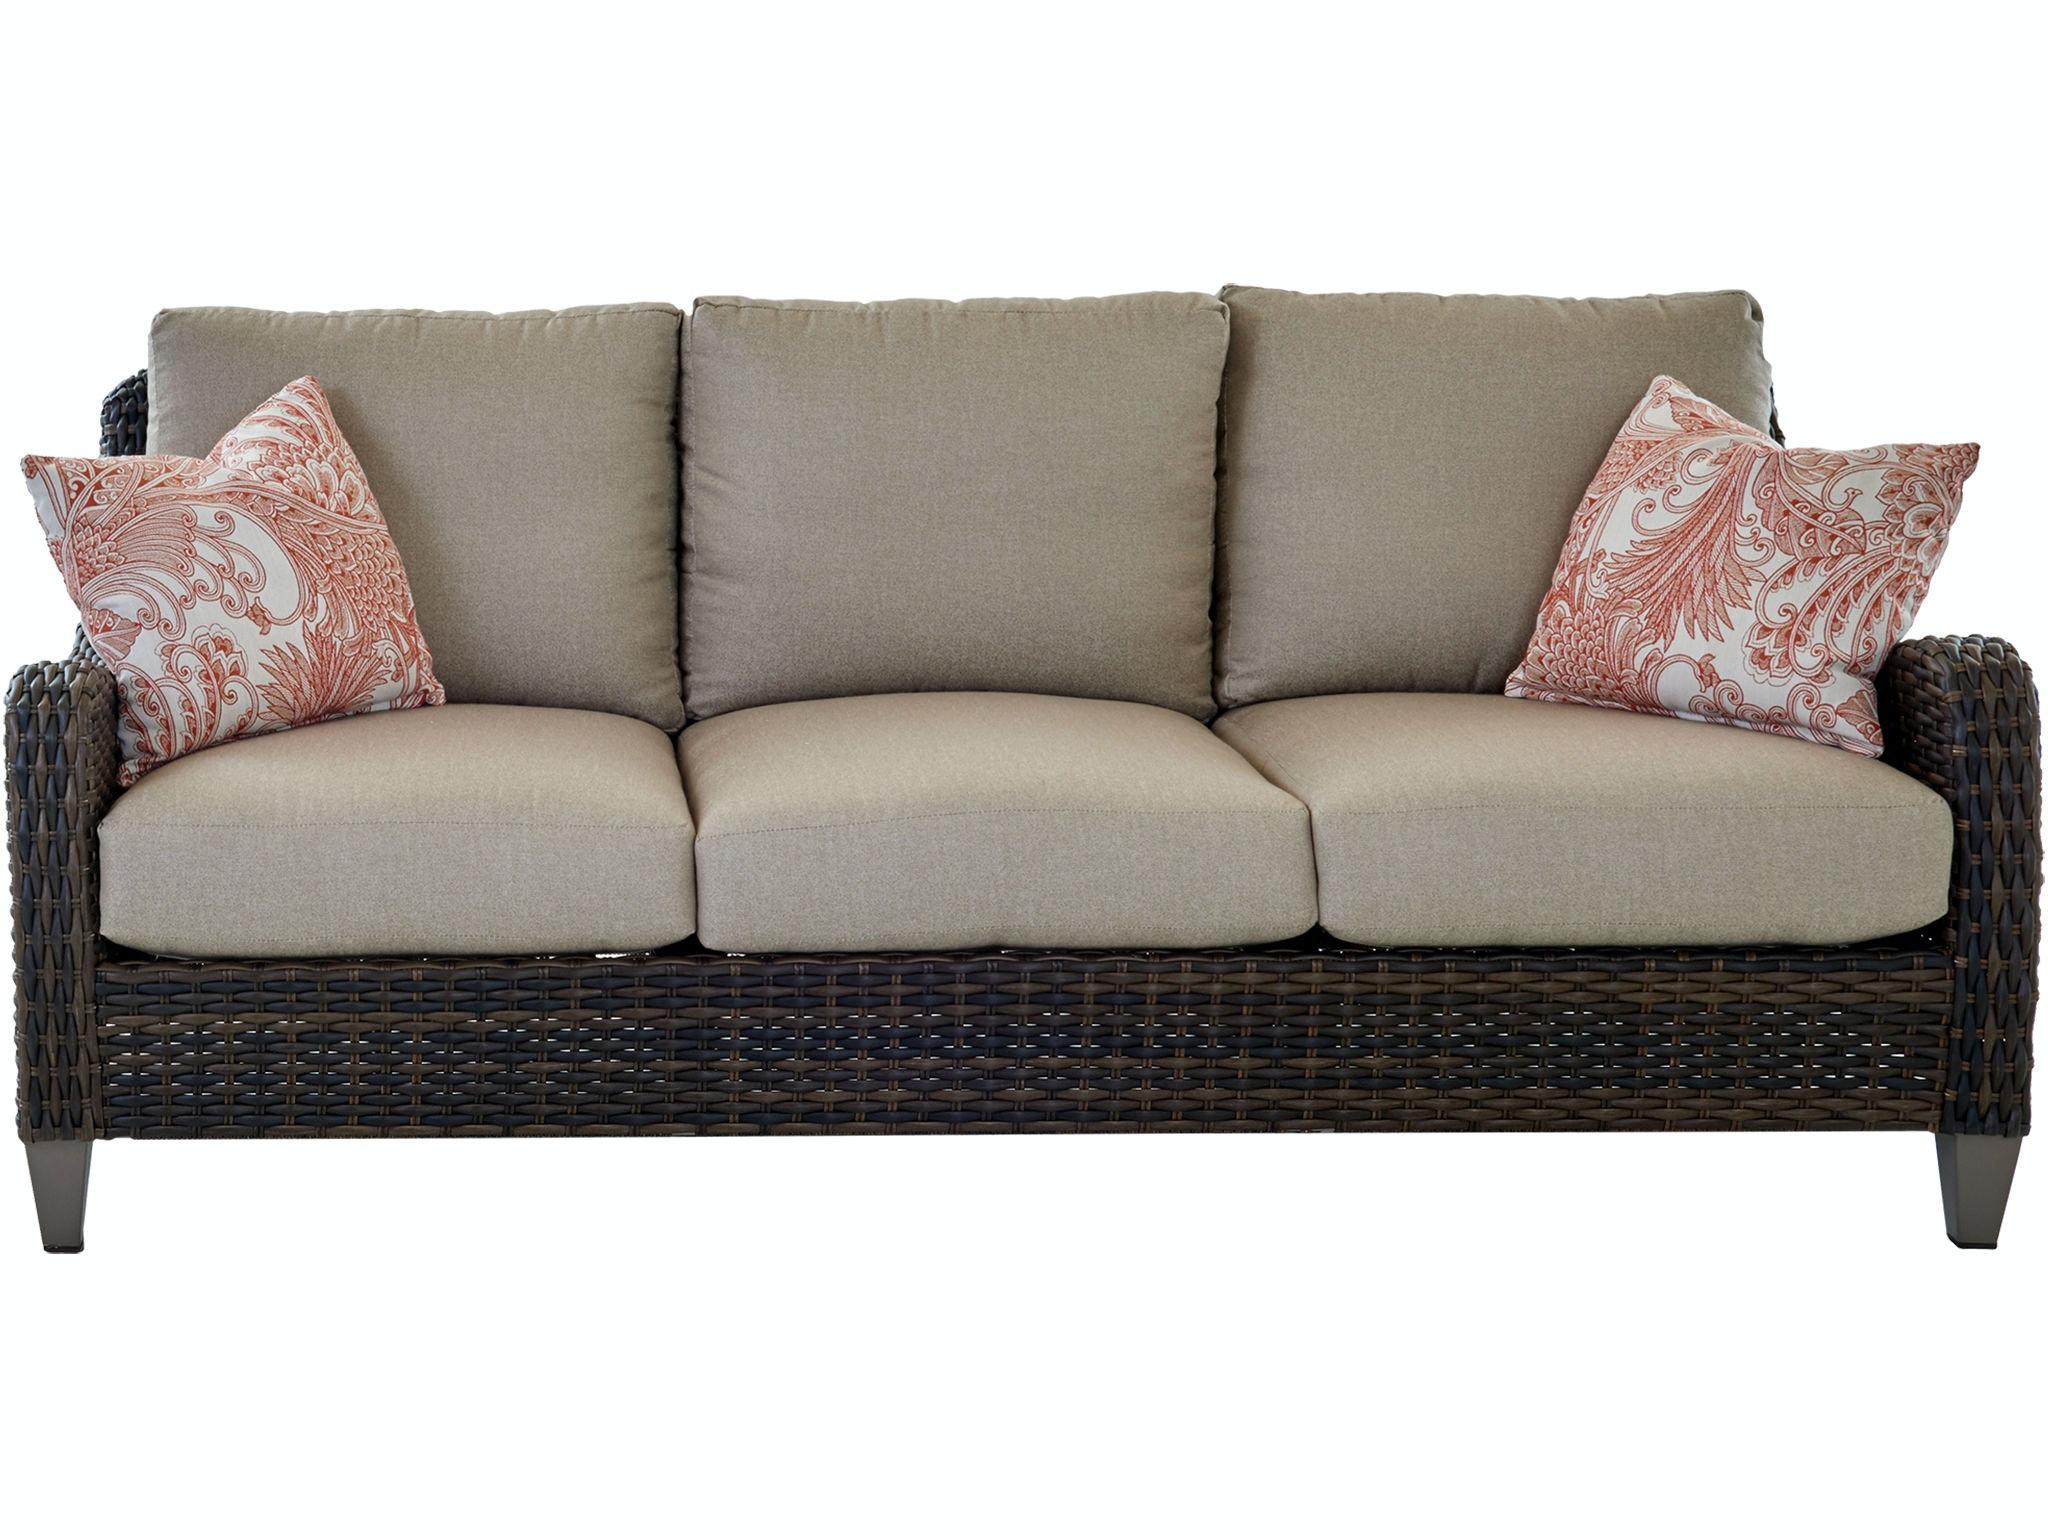 Genial Klaussner Outdoor Mesa Sofa W7502 S